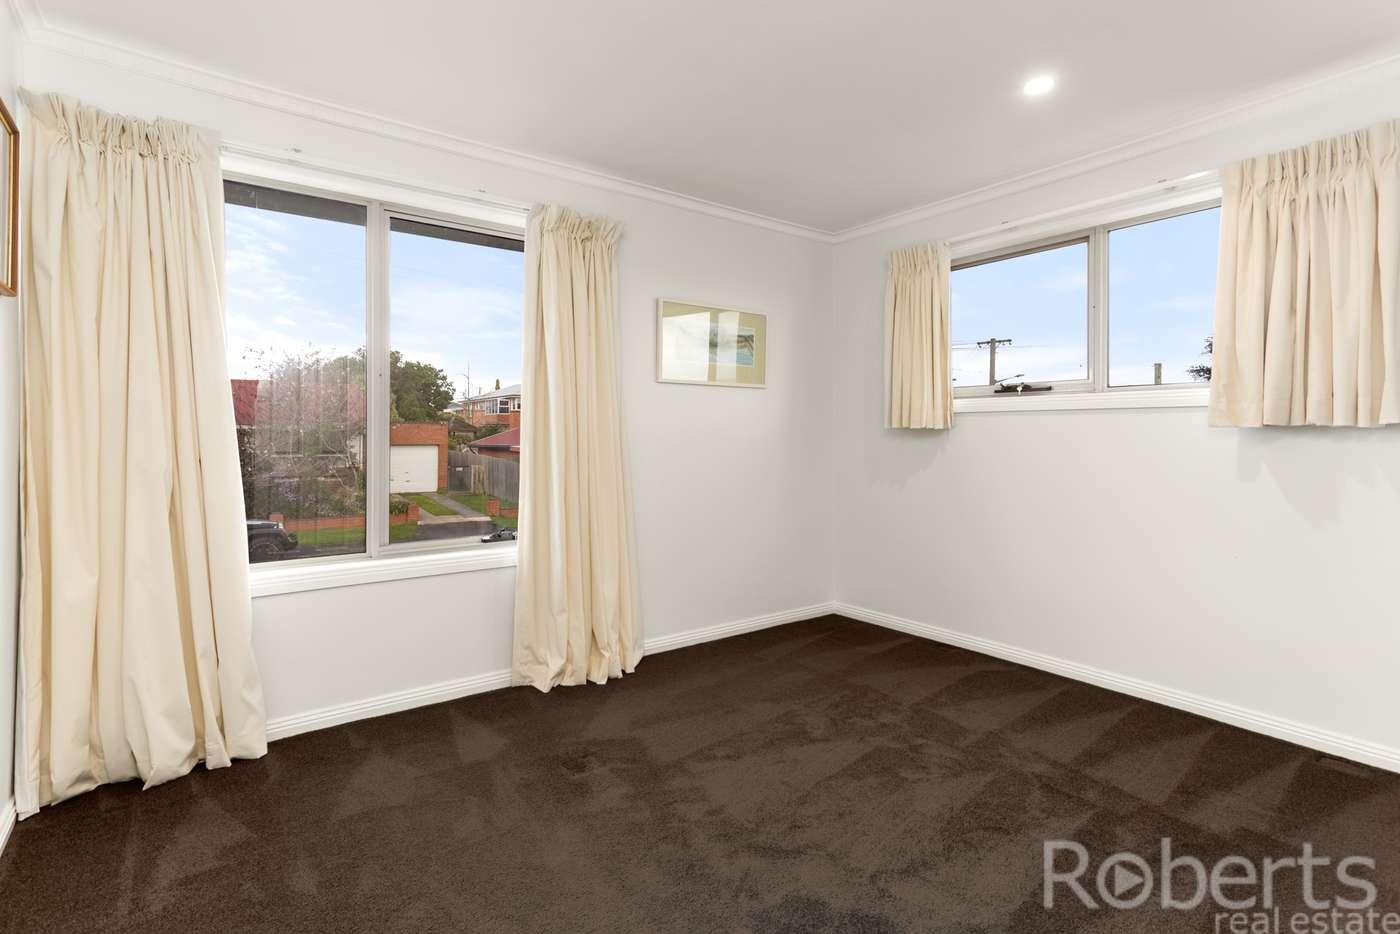 Seventh view of Homely house listing, 31 Henrietta Grove, West Launceston TAS 7250